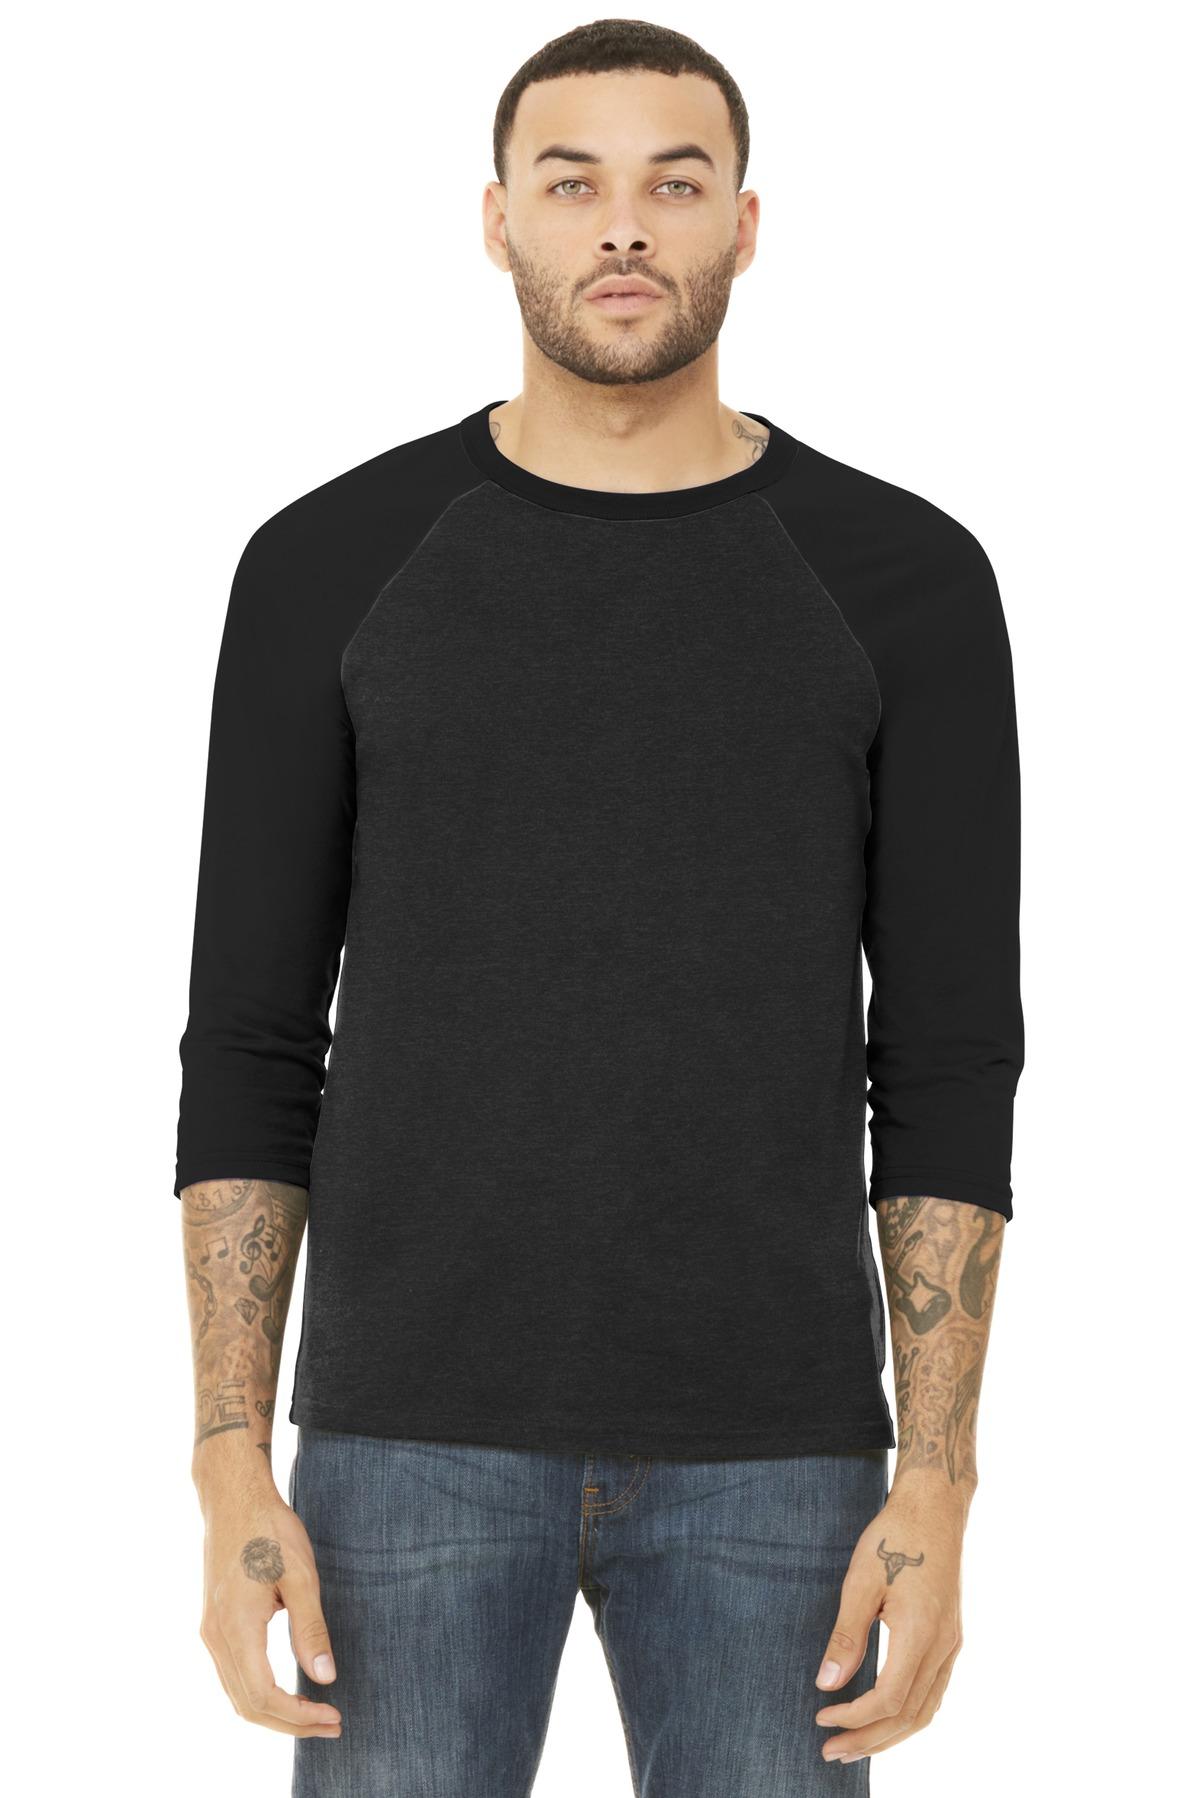 BC blackheatherblack model front